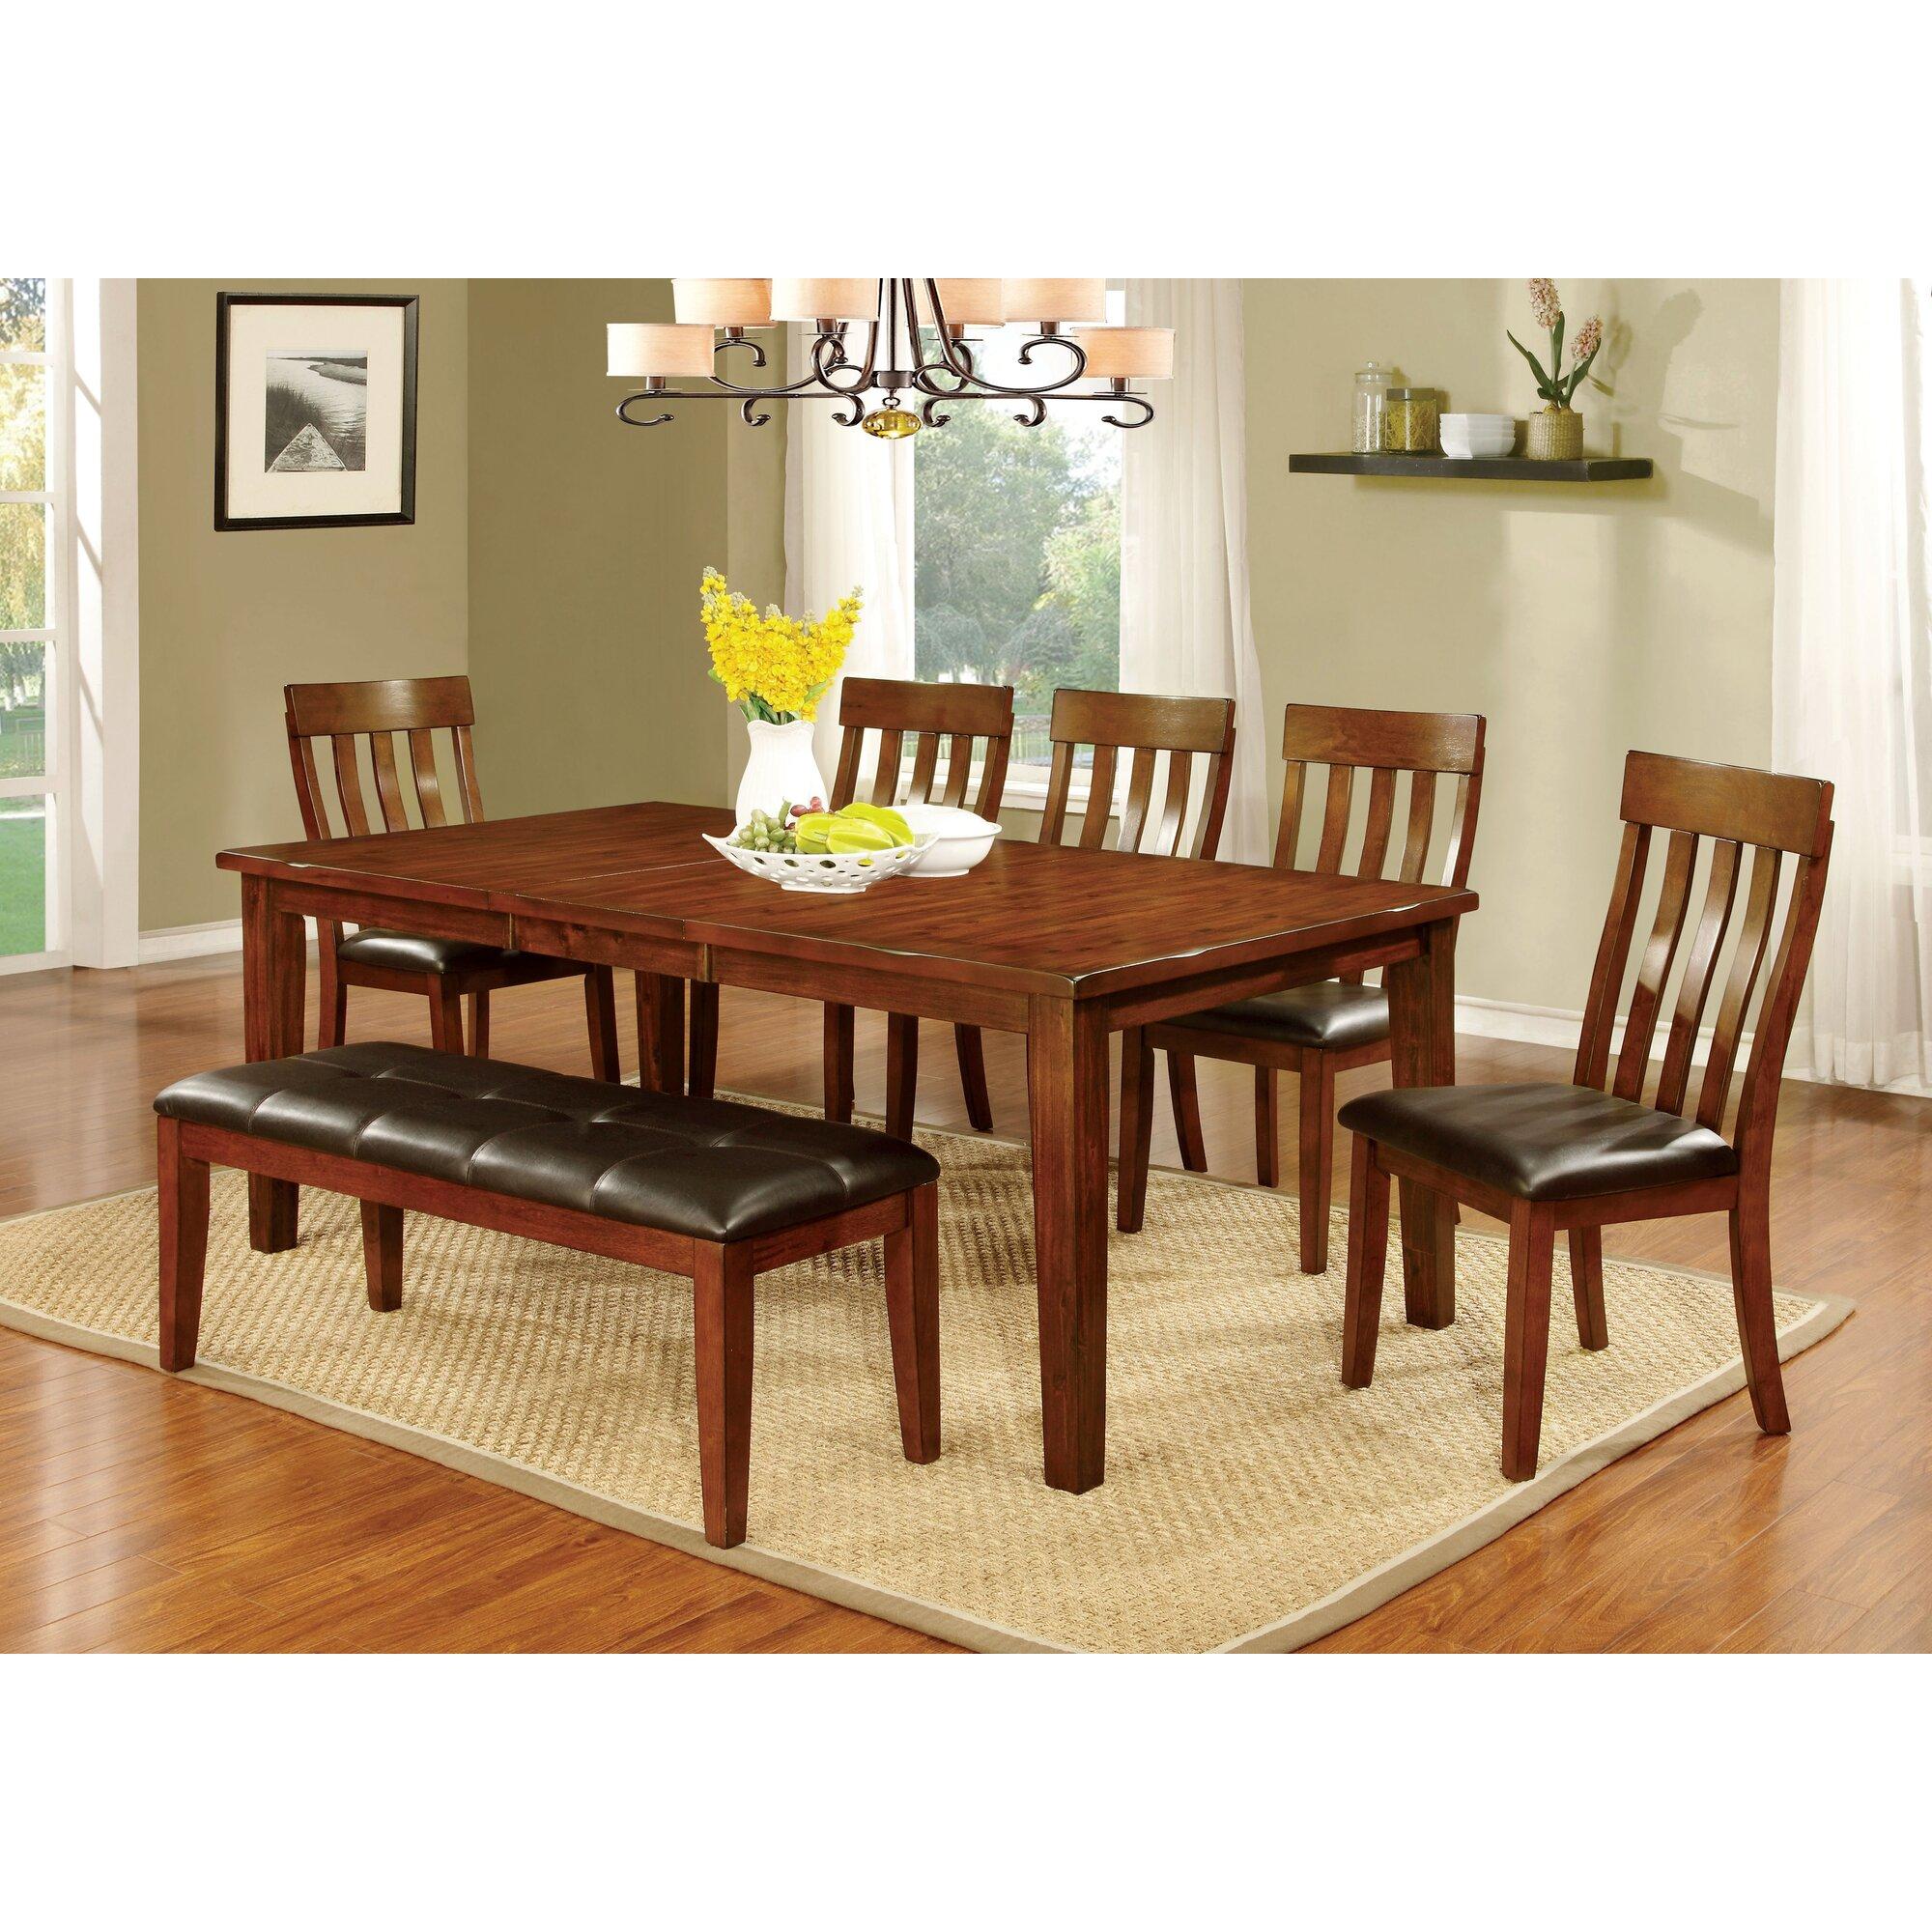 Hokku designs dunham 6 piece dining set reviews for Hokku designs dining room furniture